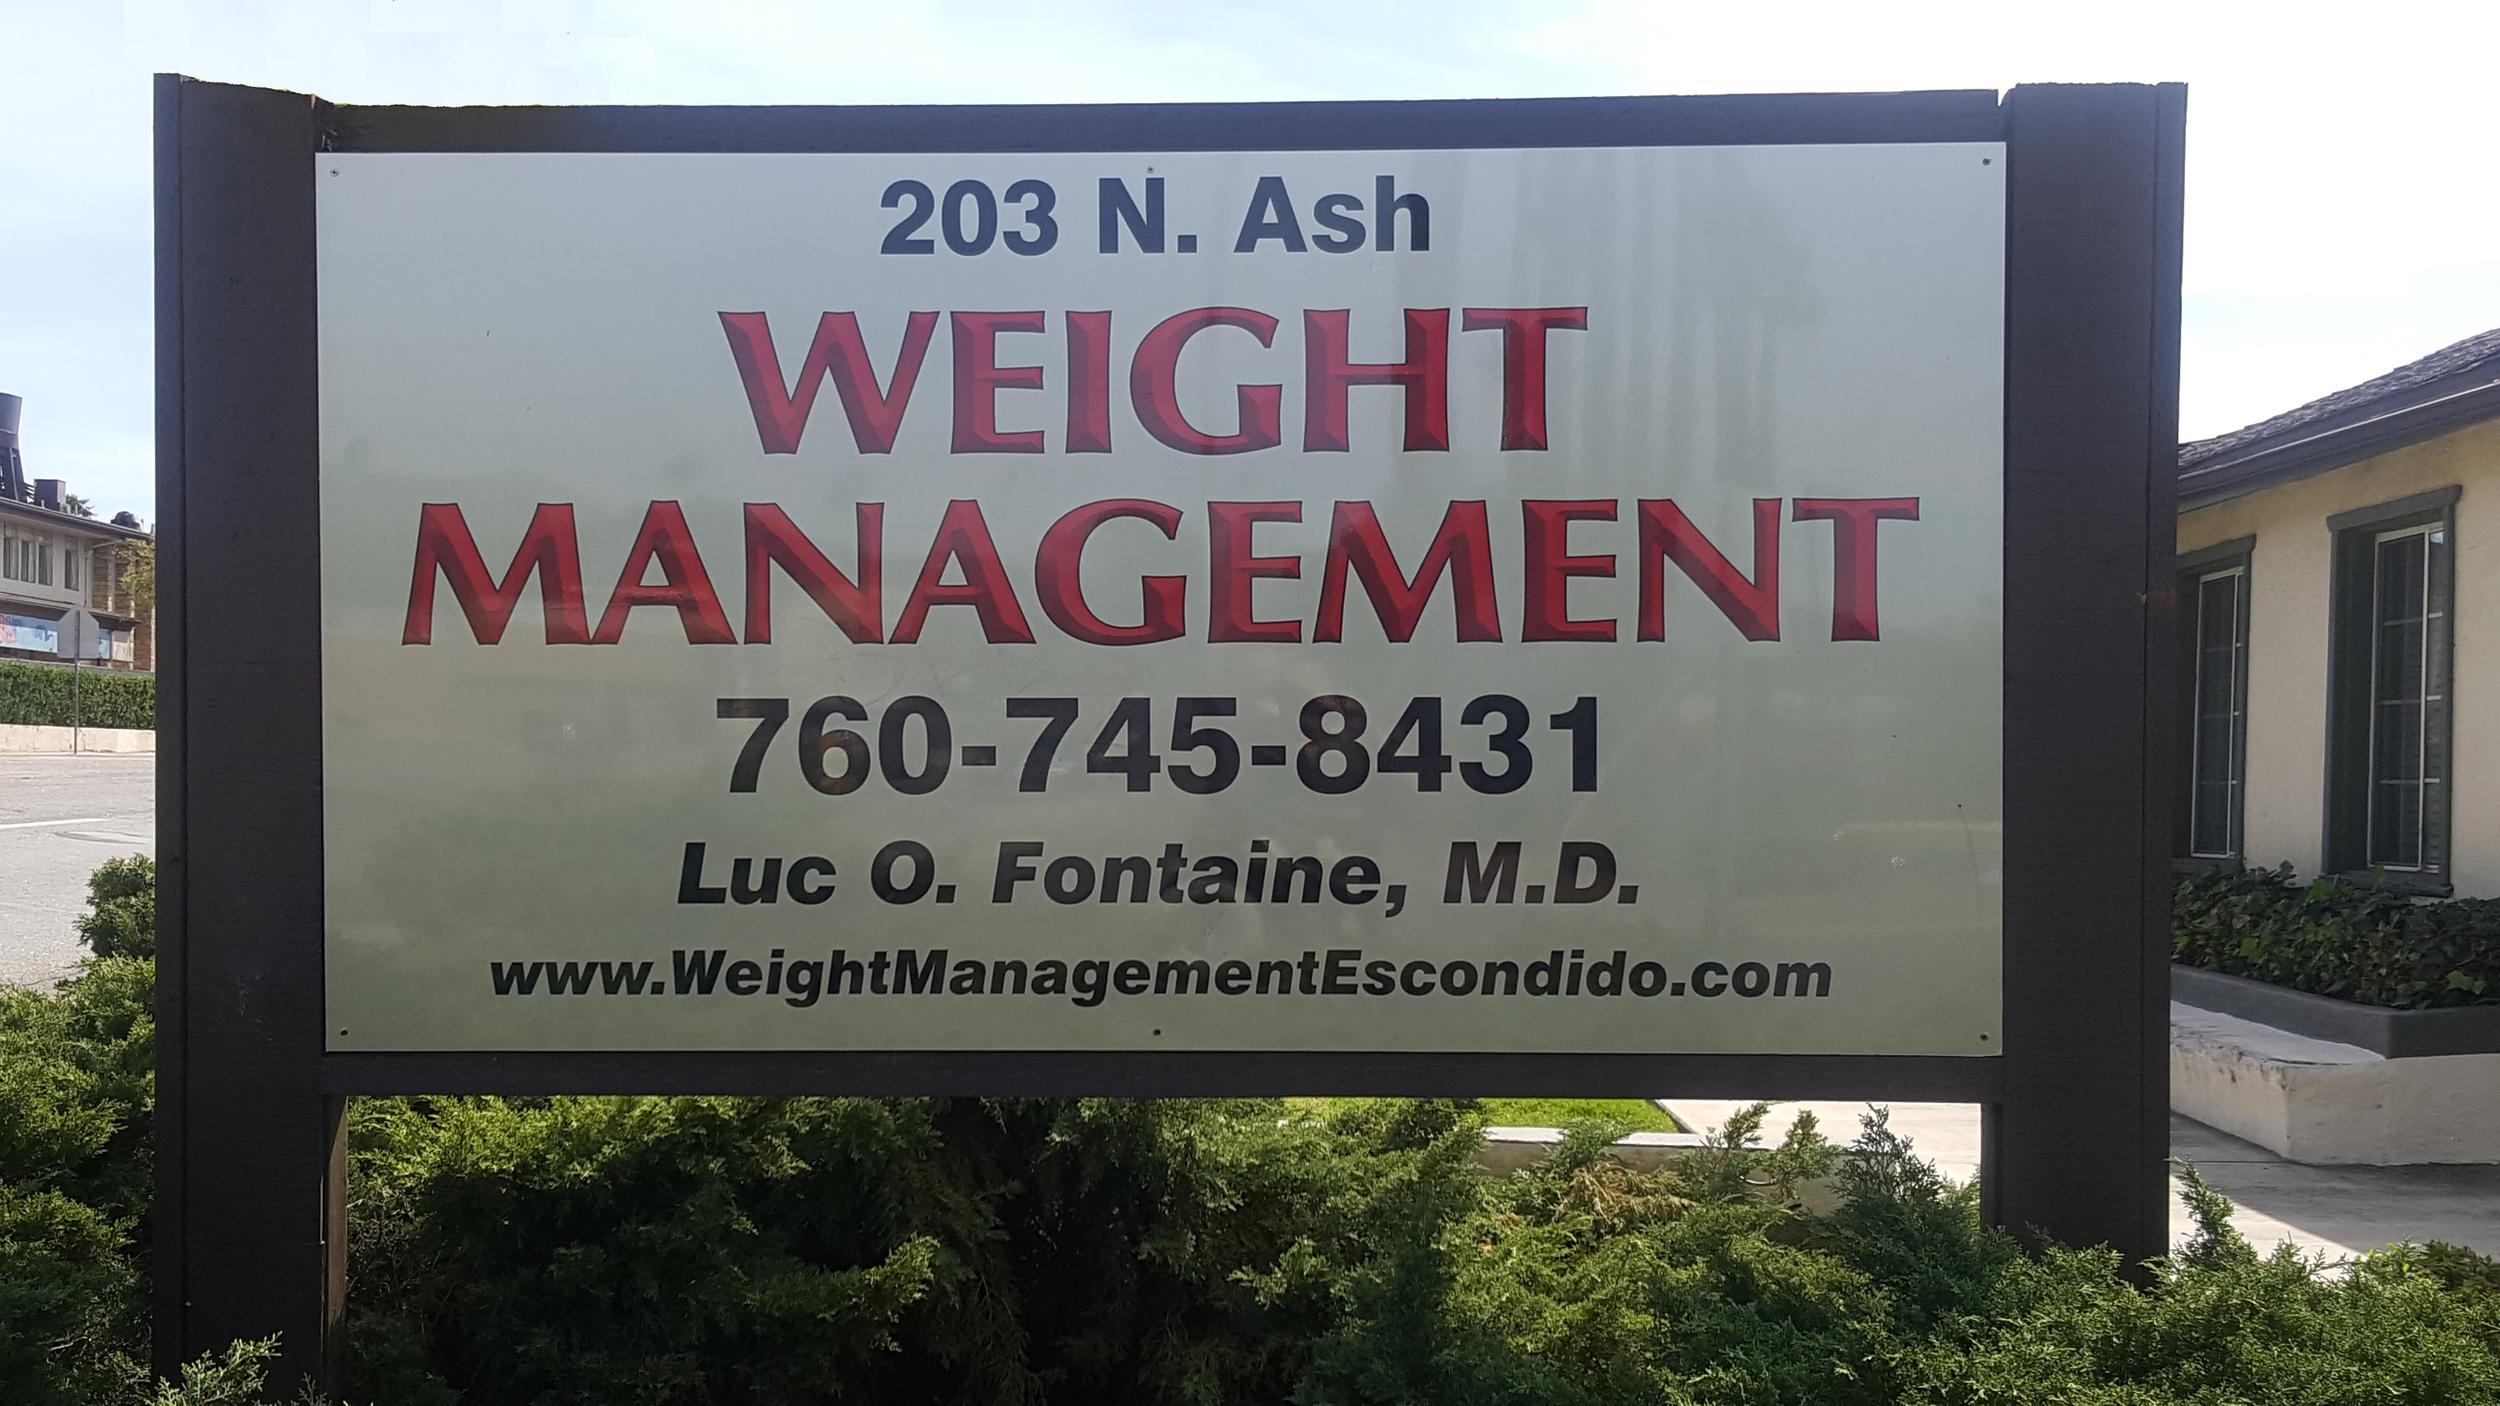 Weight Management Center, Escondido CA - Building Sign